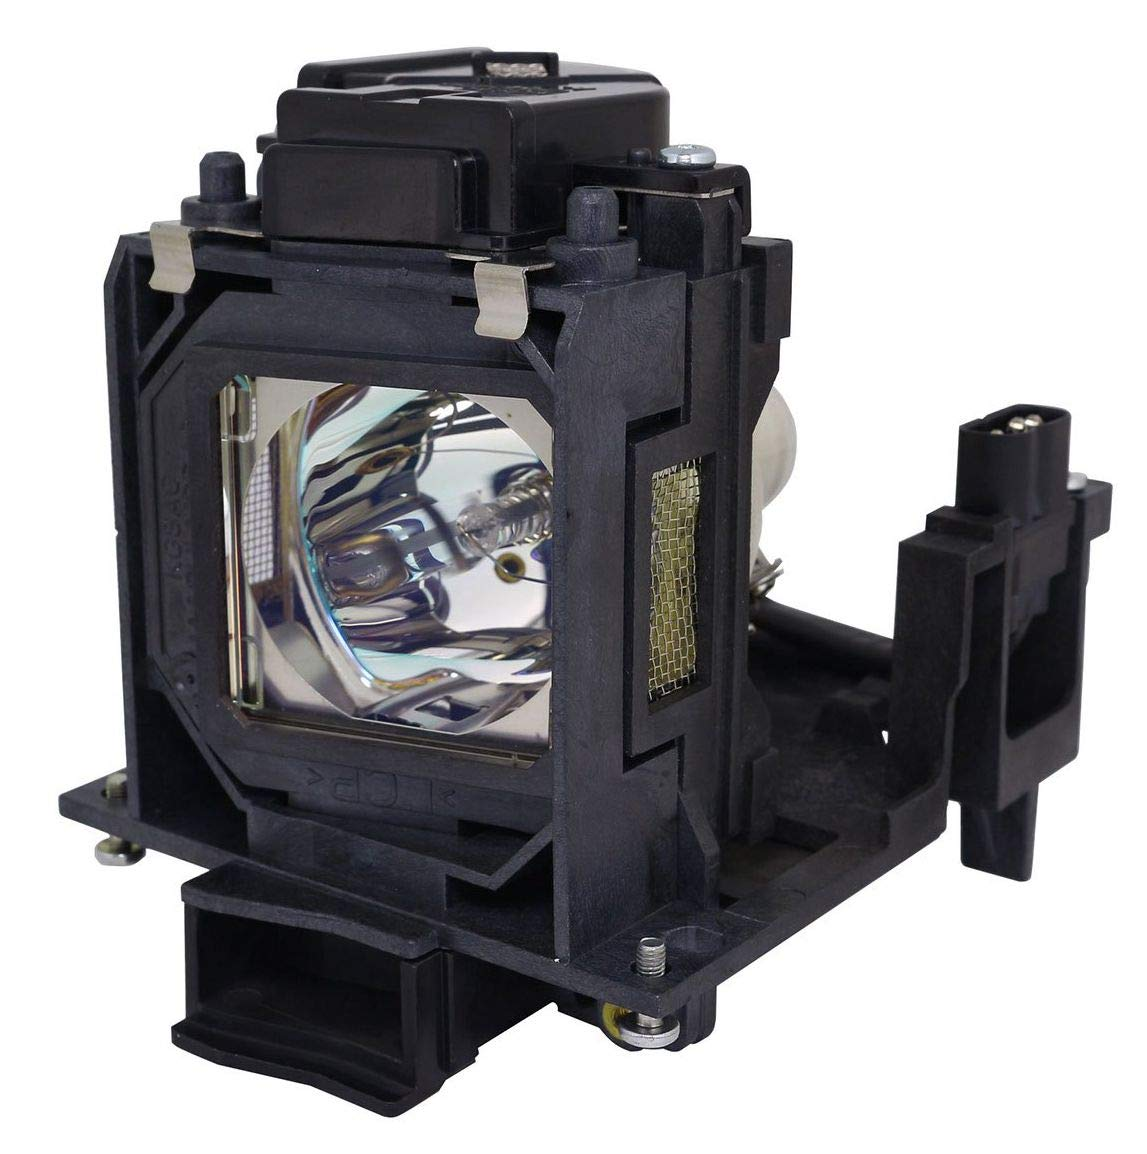 POA-LMP143/610-351-3744 прожекторная лампа для Sanyo PDG-DXL2000 DXL2000 DWL2500 PDG-DWL2500 PDG-DWL2500S PDG-DXL2000S PLC-DXL2500